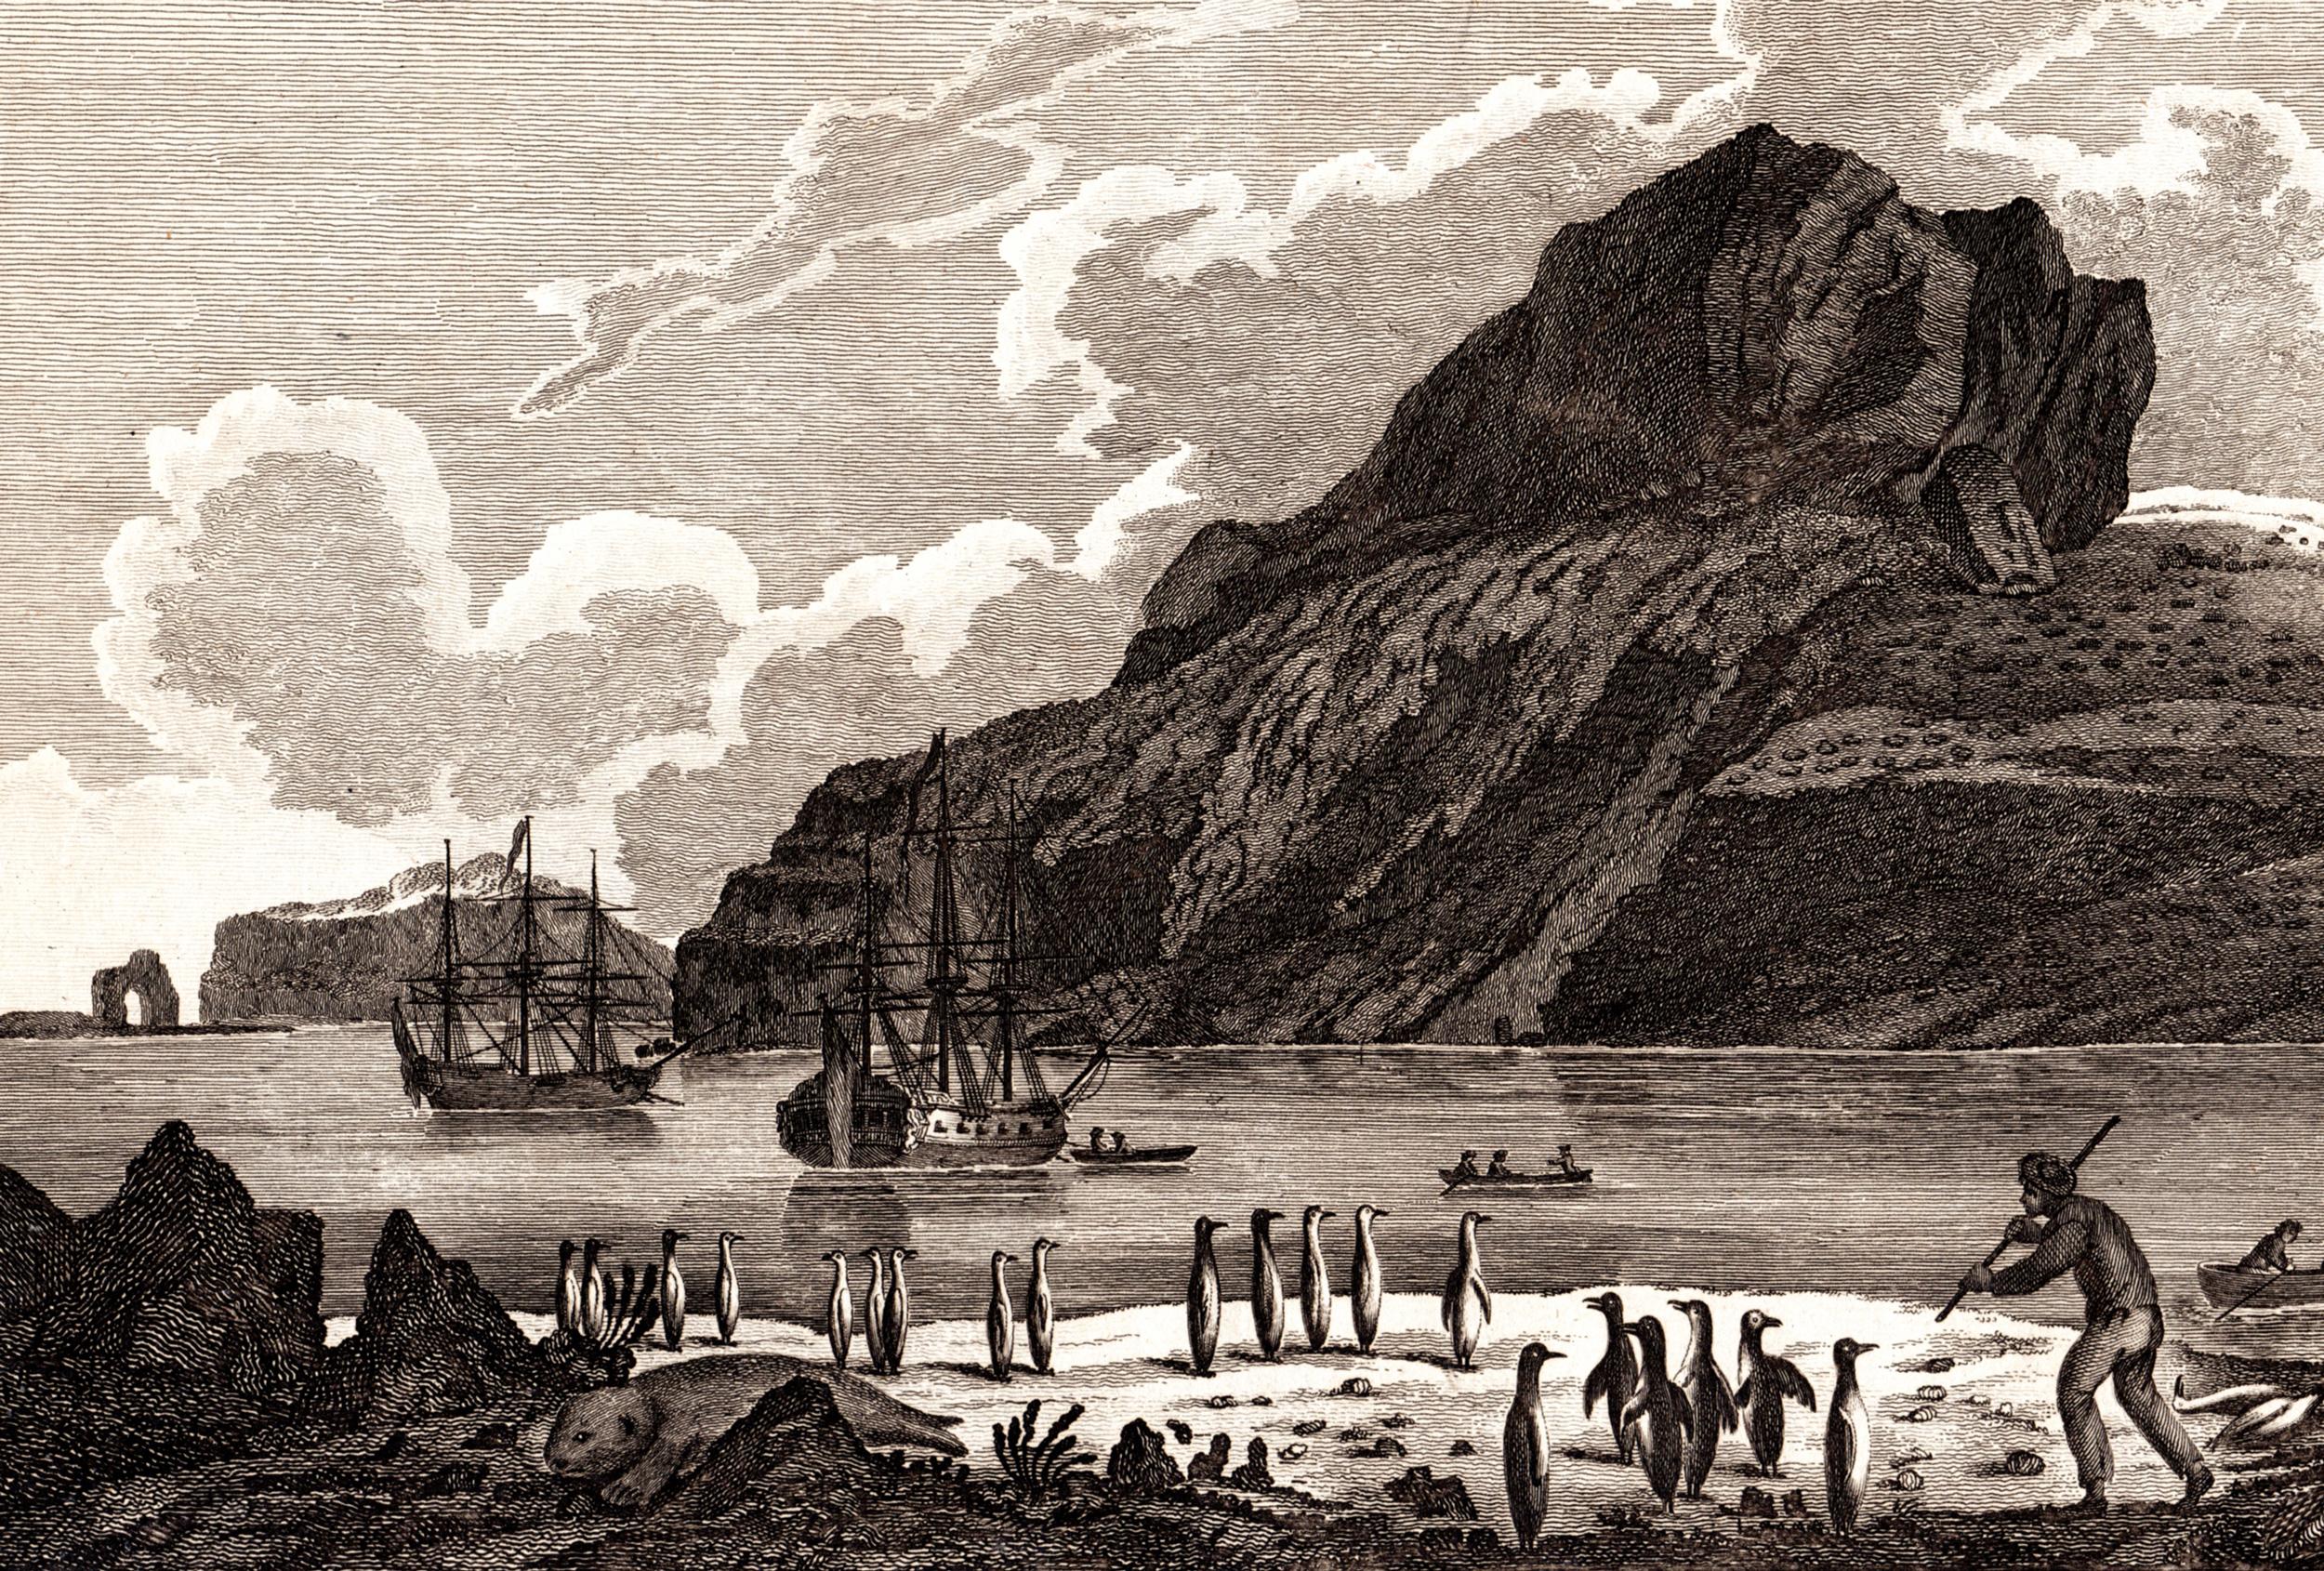 Anderson, George Wm / Capt. Cook's Voyages